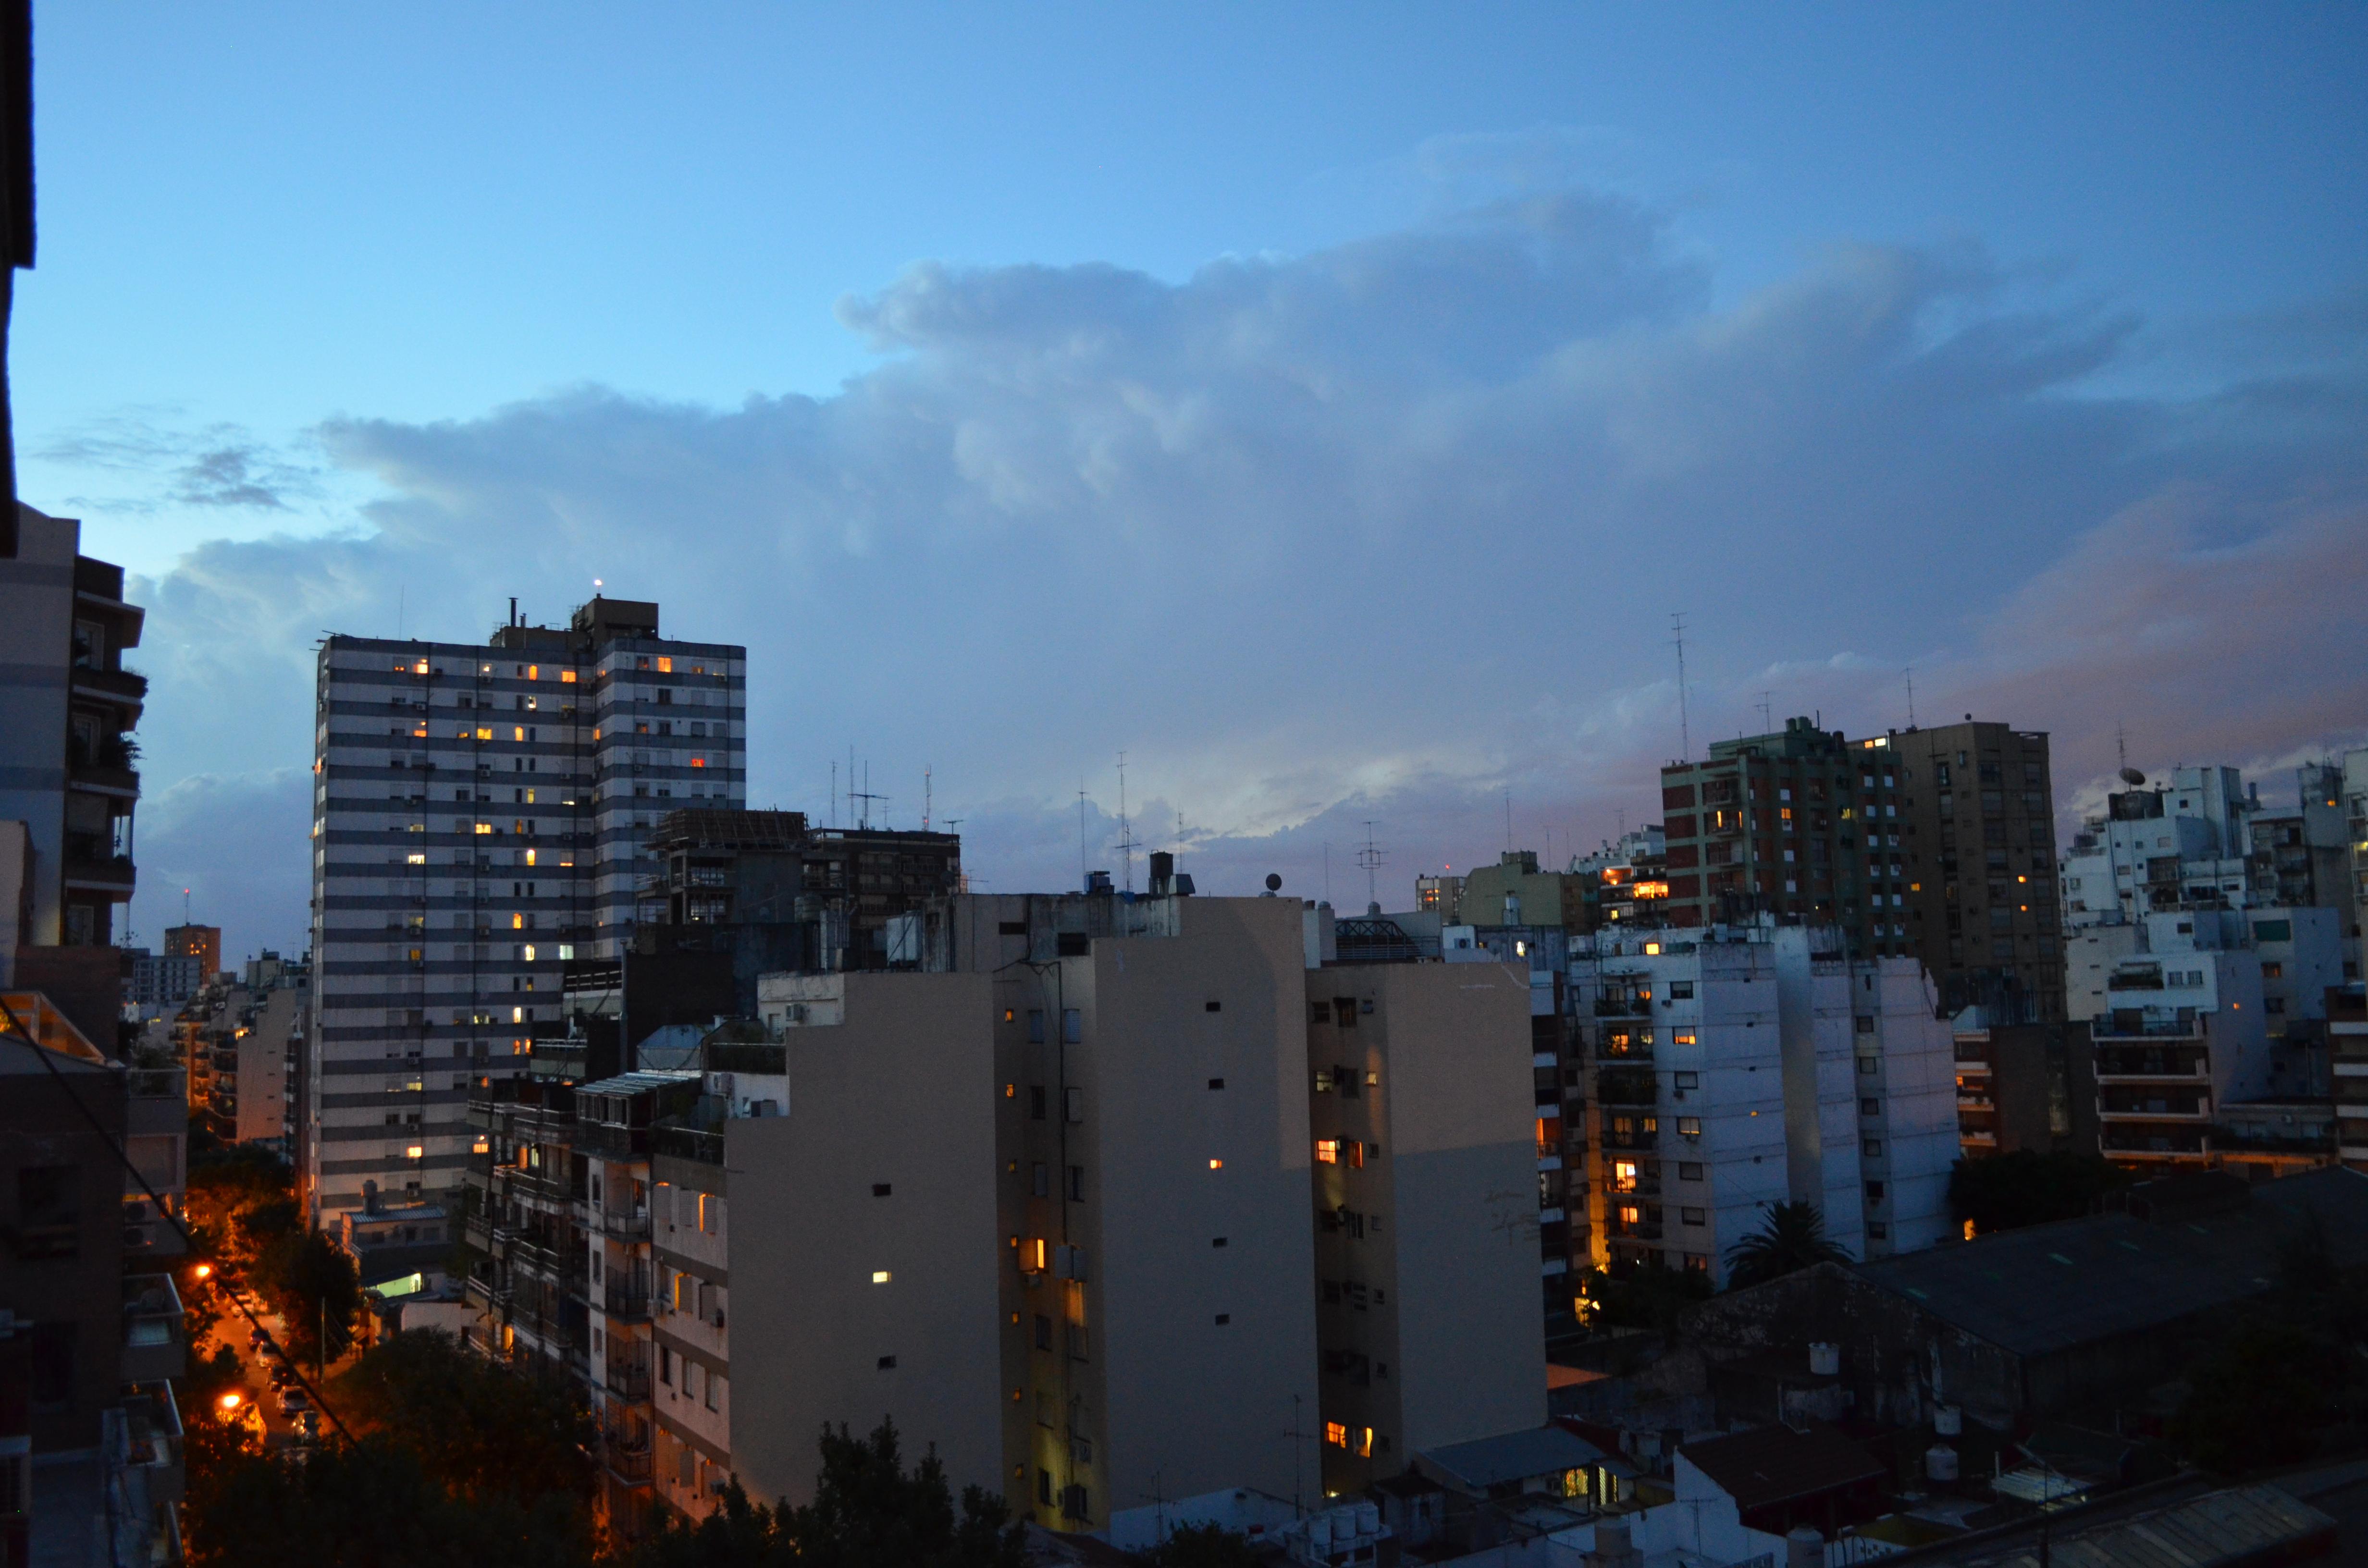 Sky and Buildings, Sky, Evening, Dusk, Buildings, HQ Photo